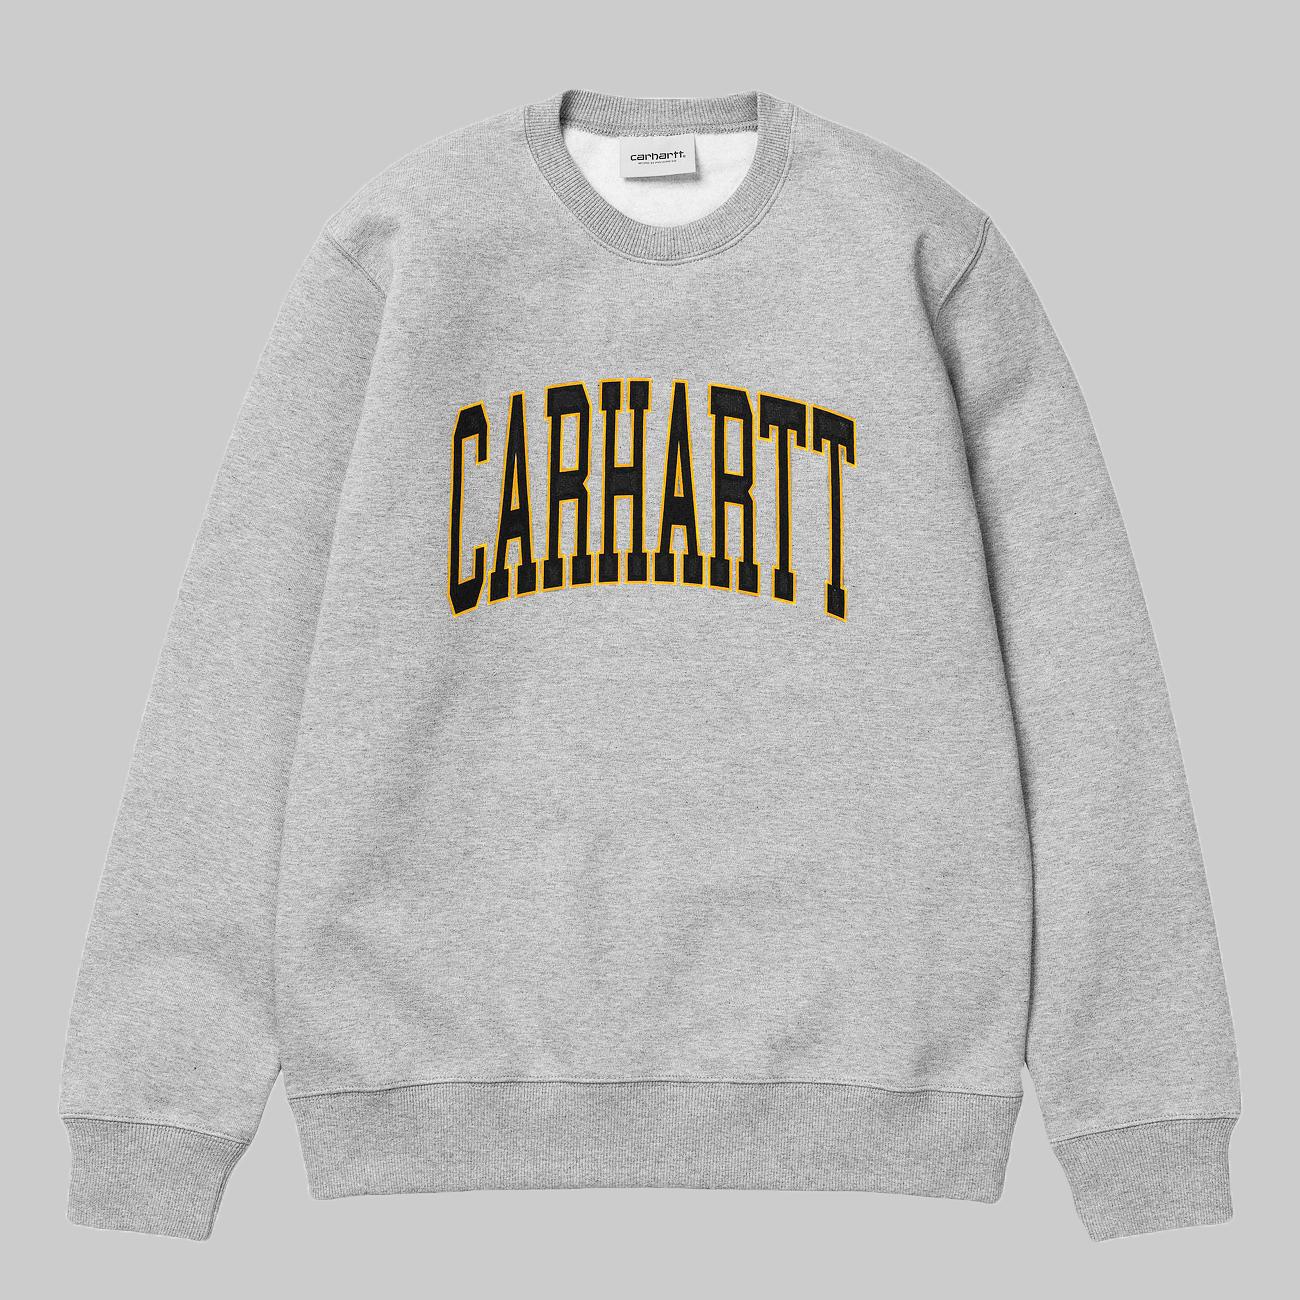 CARHARTT WIP DIVISION SWEATSHIRT.